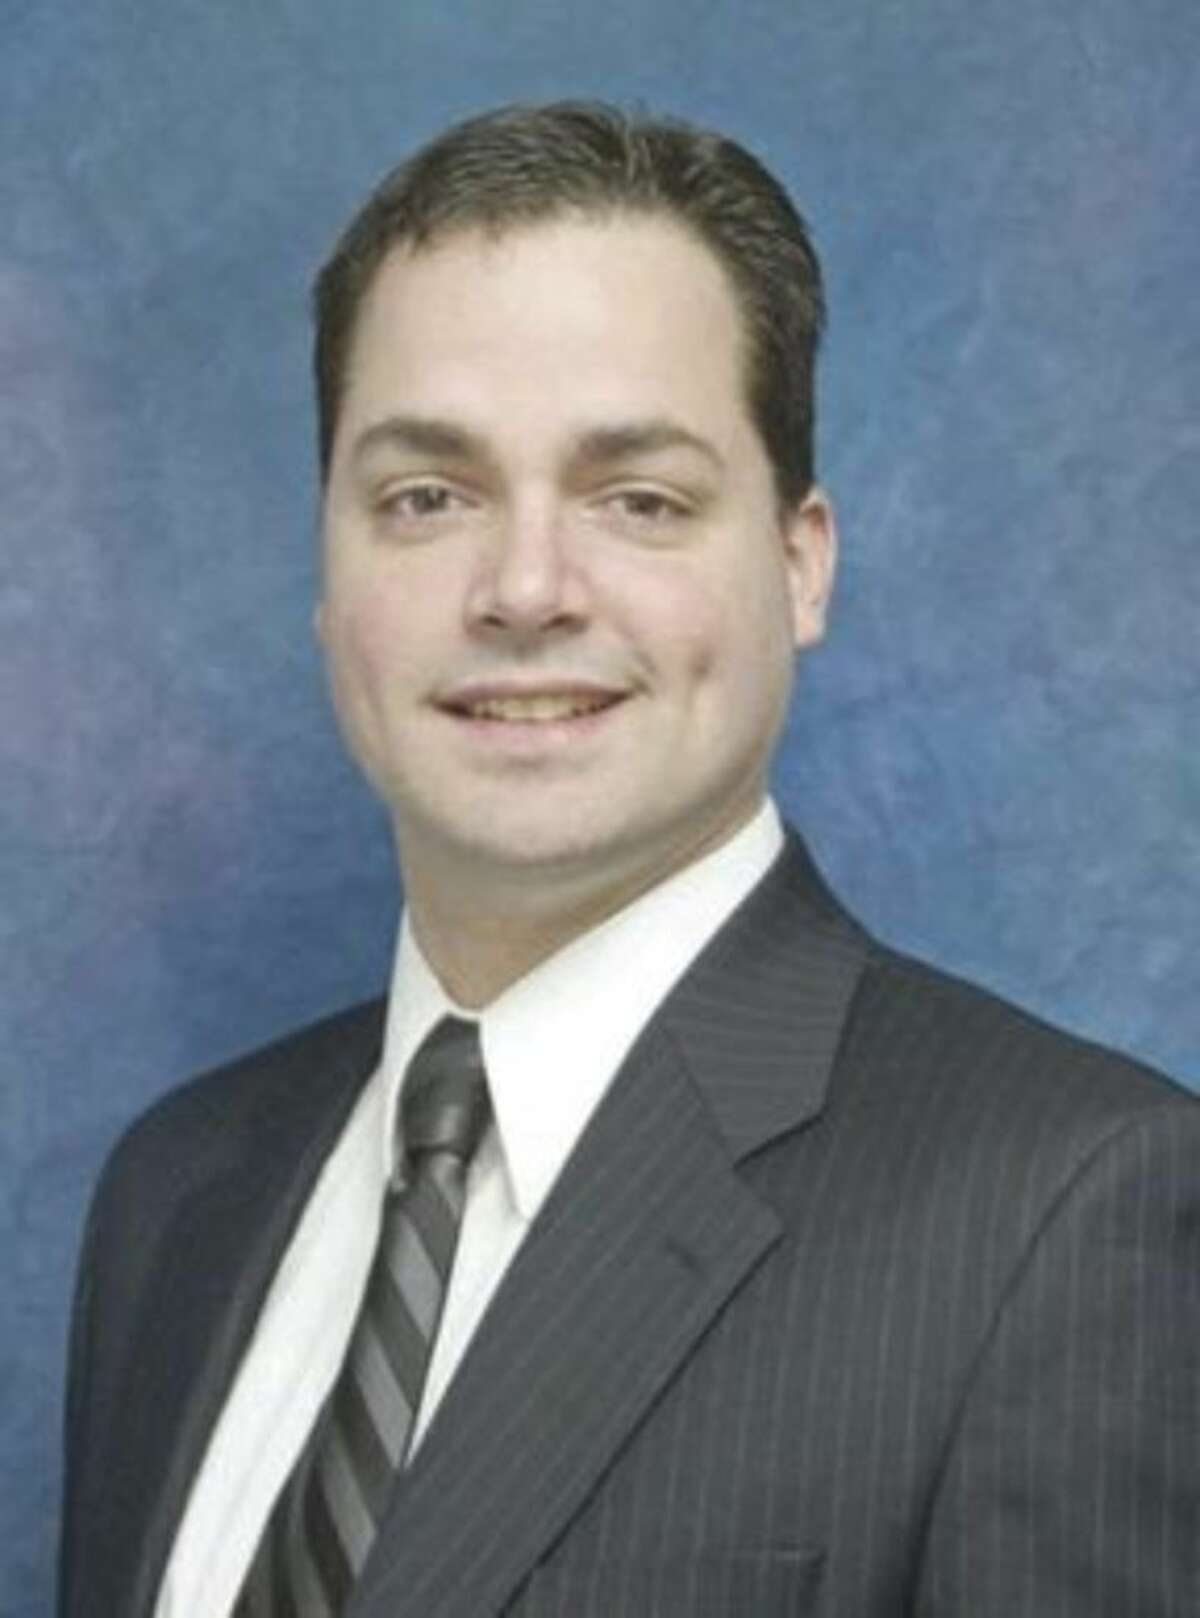 Anthony DiLauro